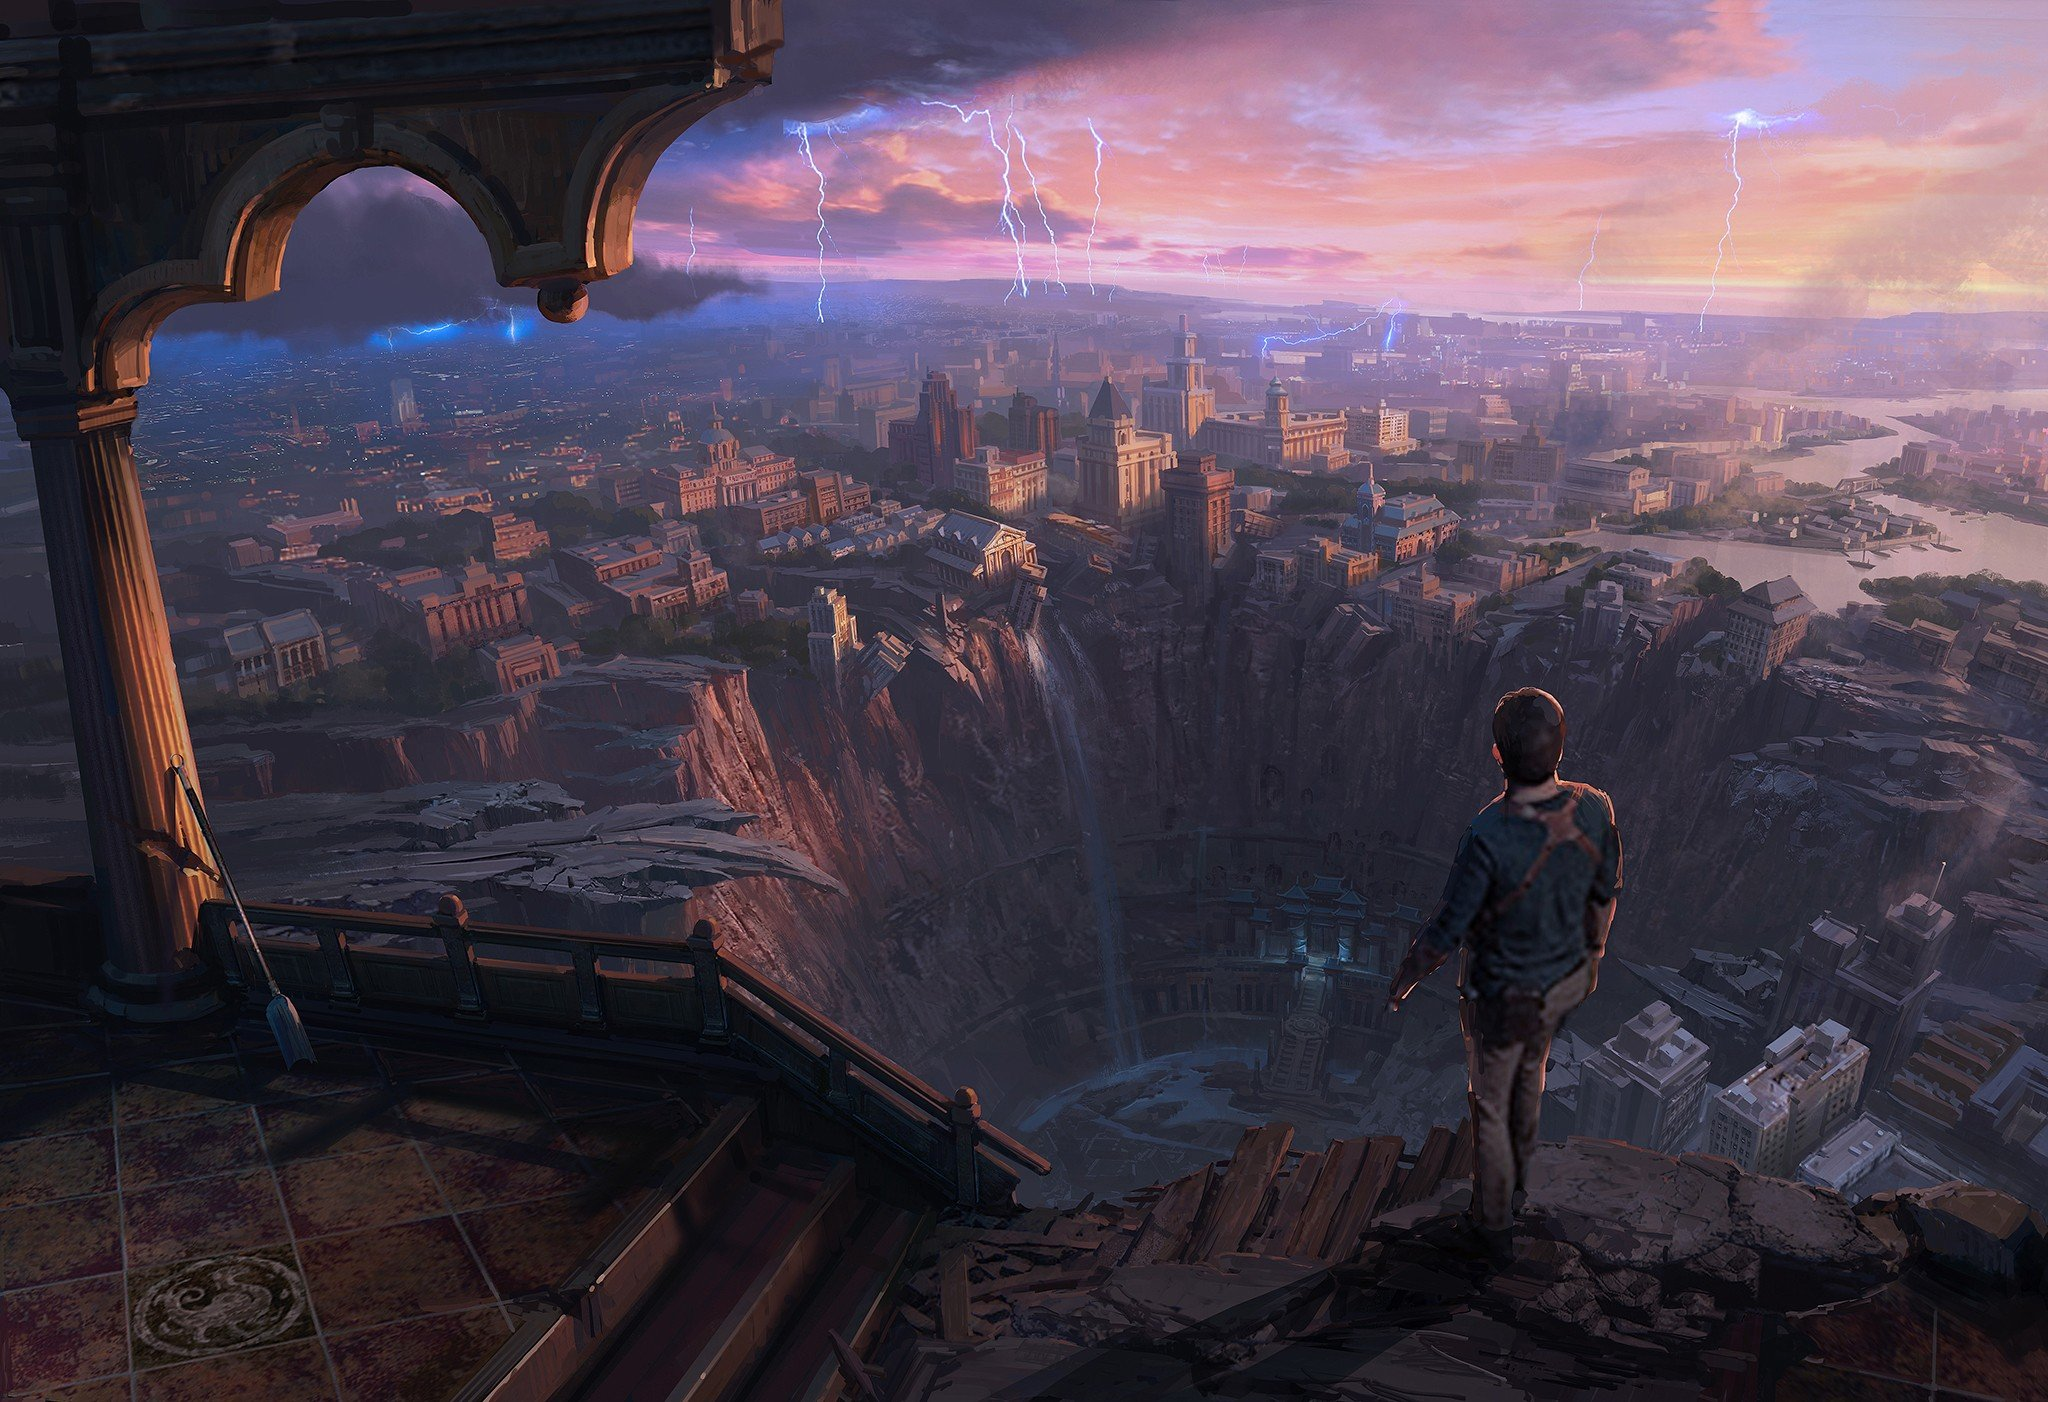 illustration, Fantasy art, Sunset Wallpaper